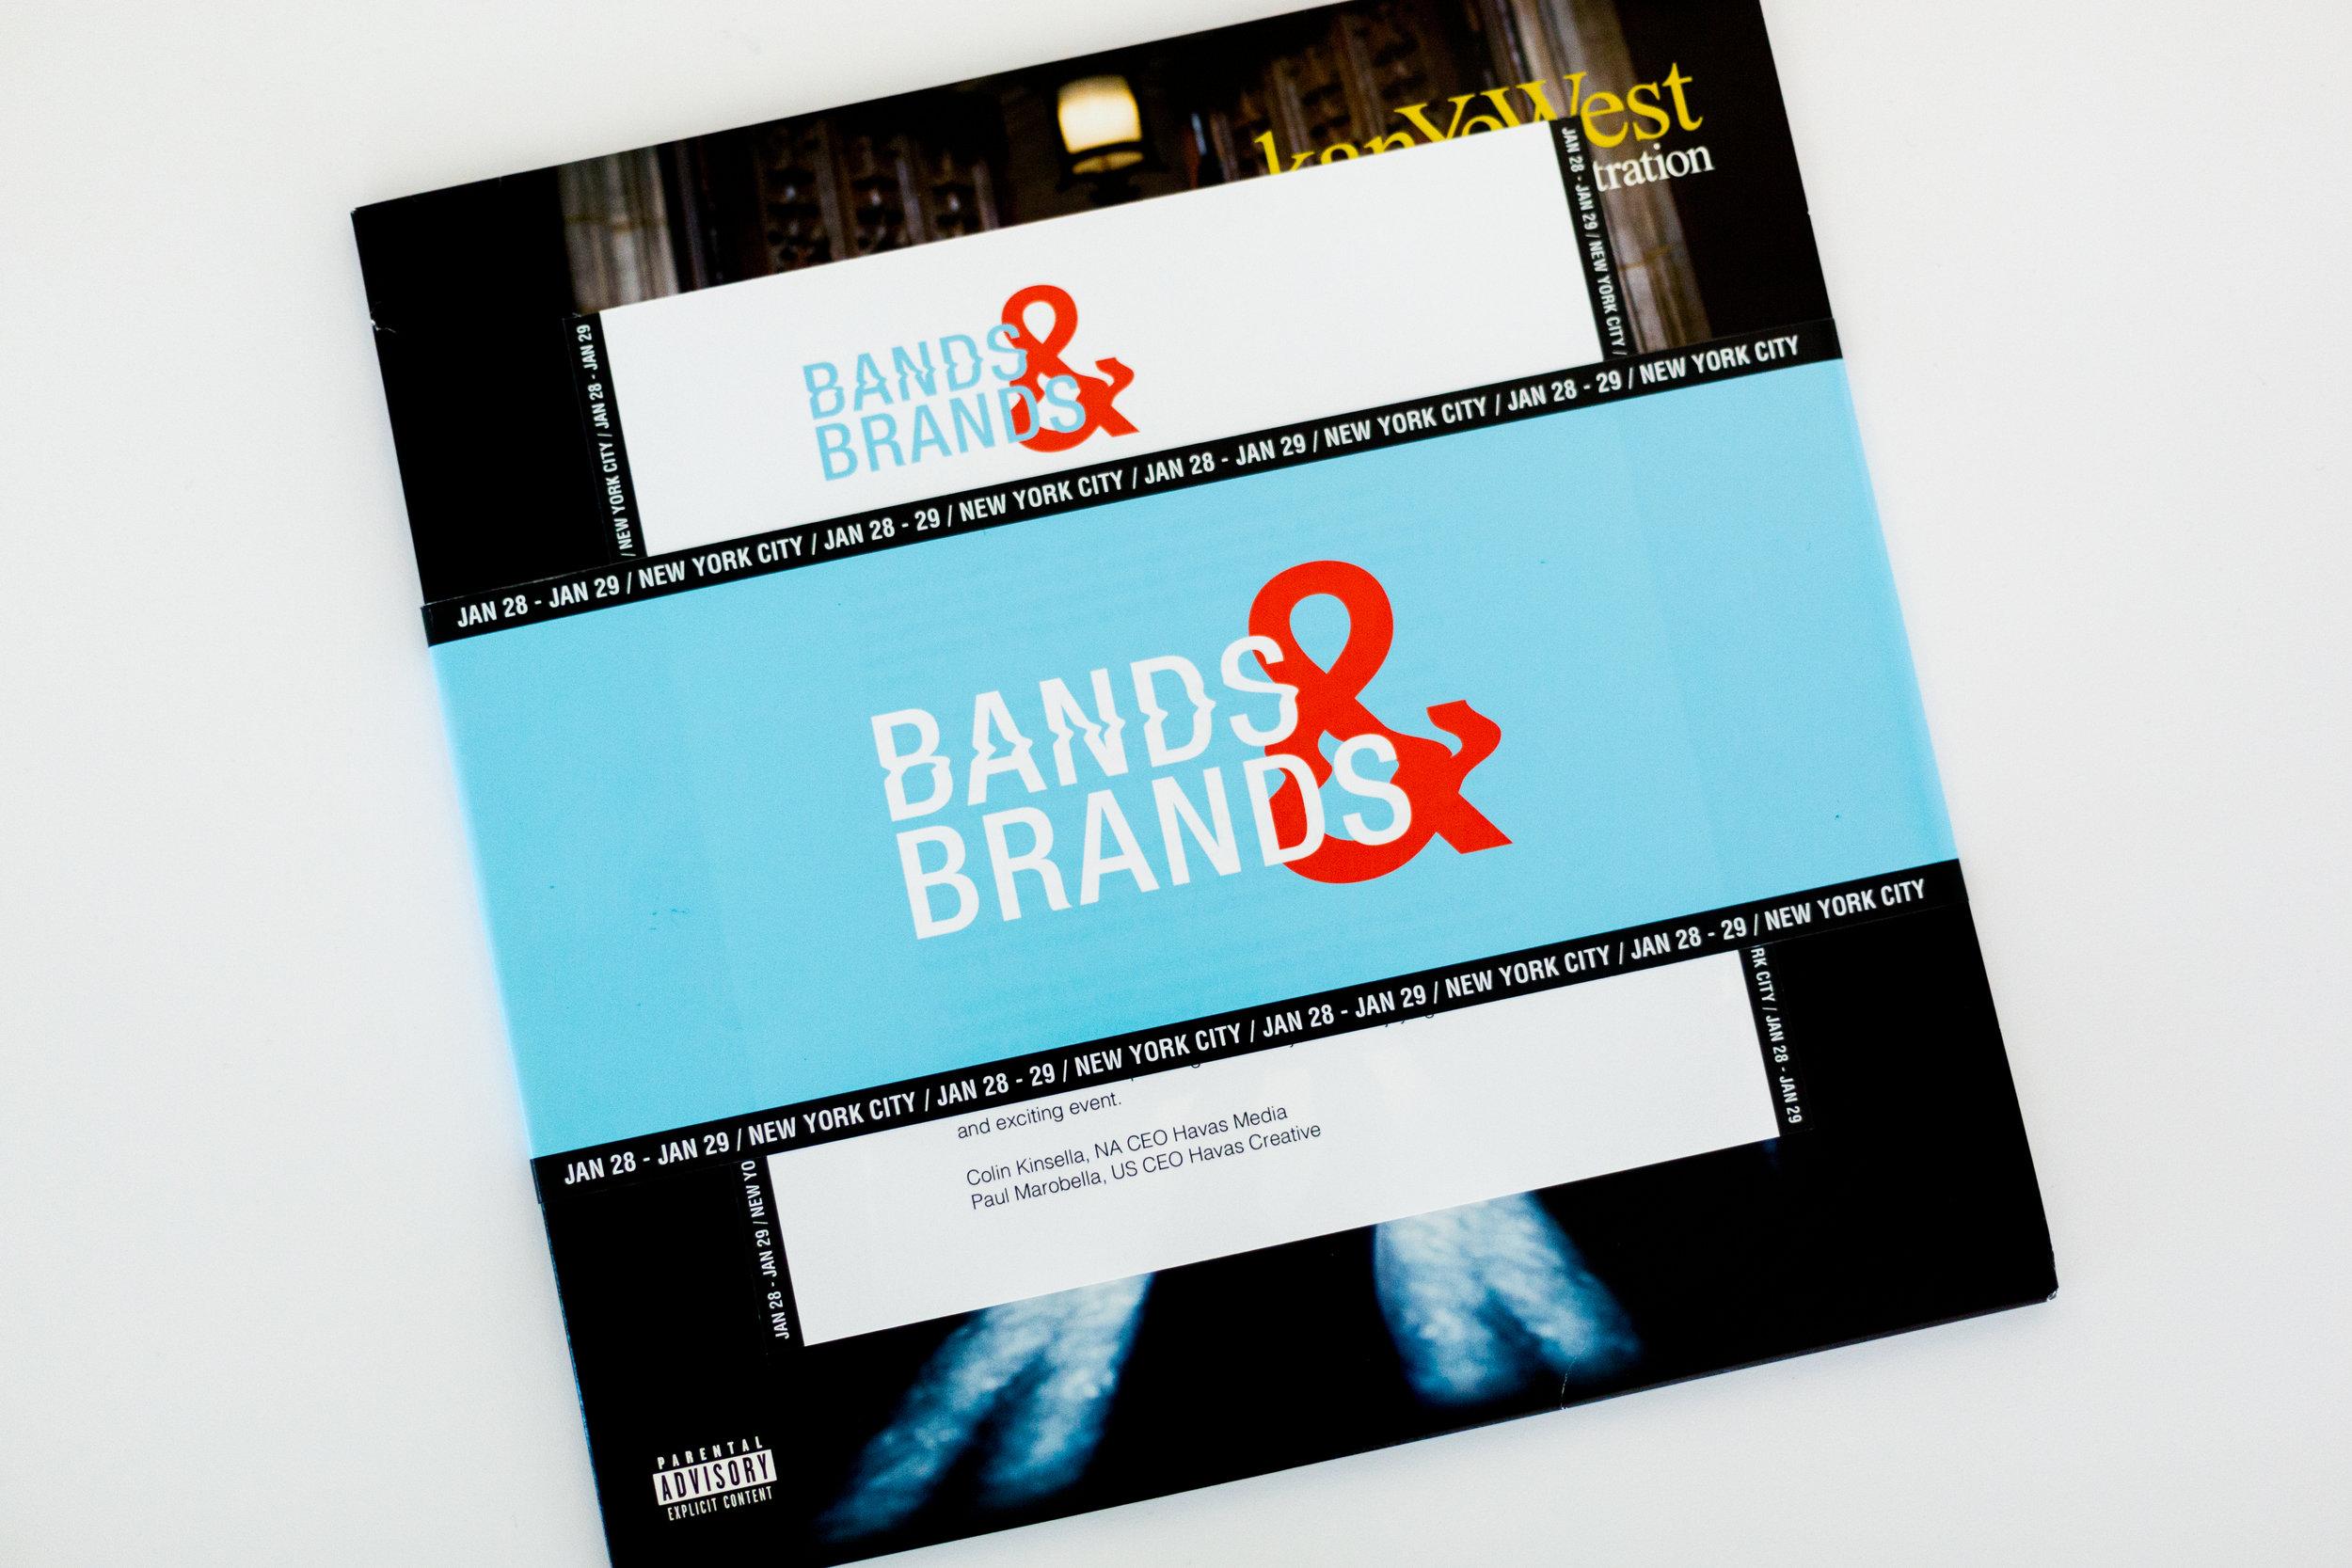 Bands&Brands_Invite_05.jpg